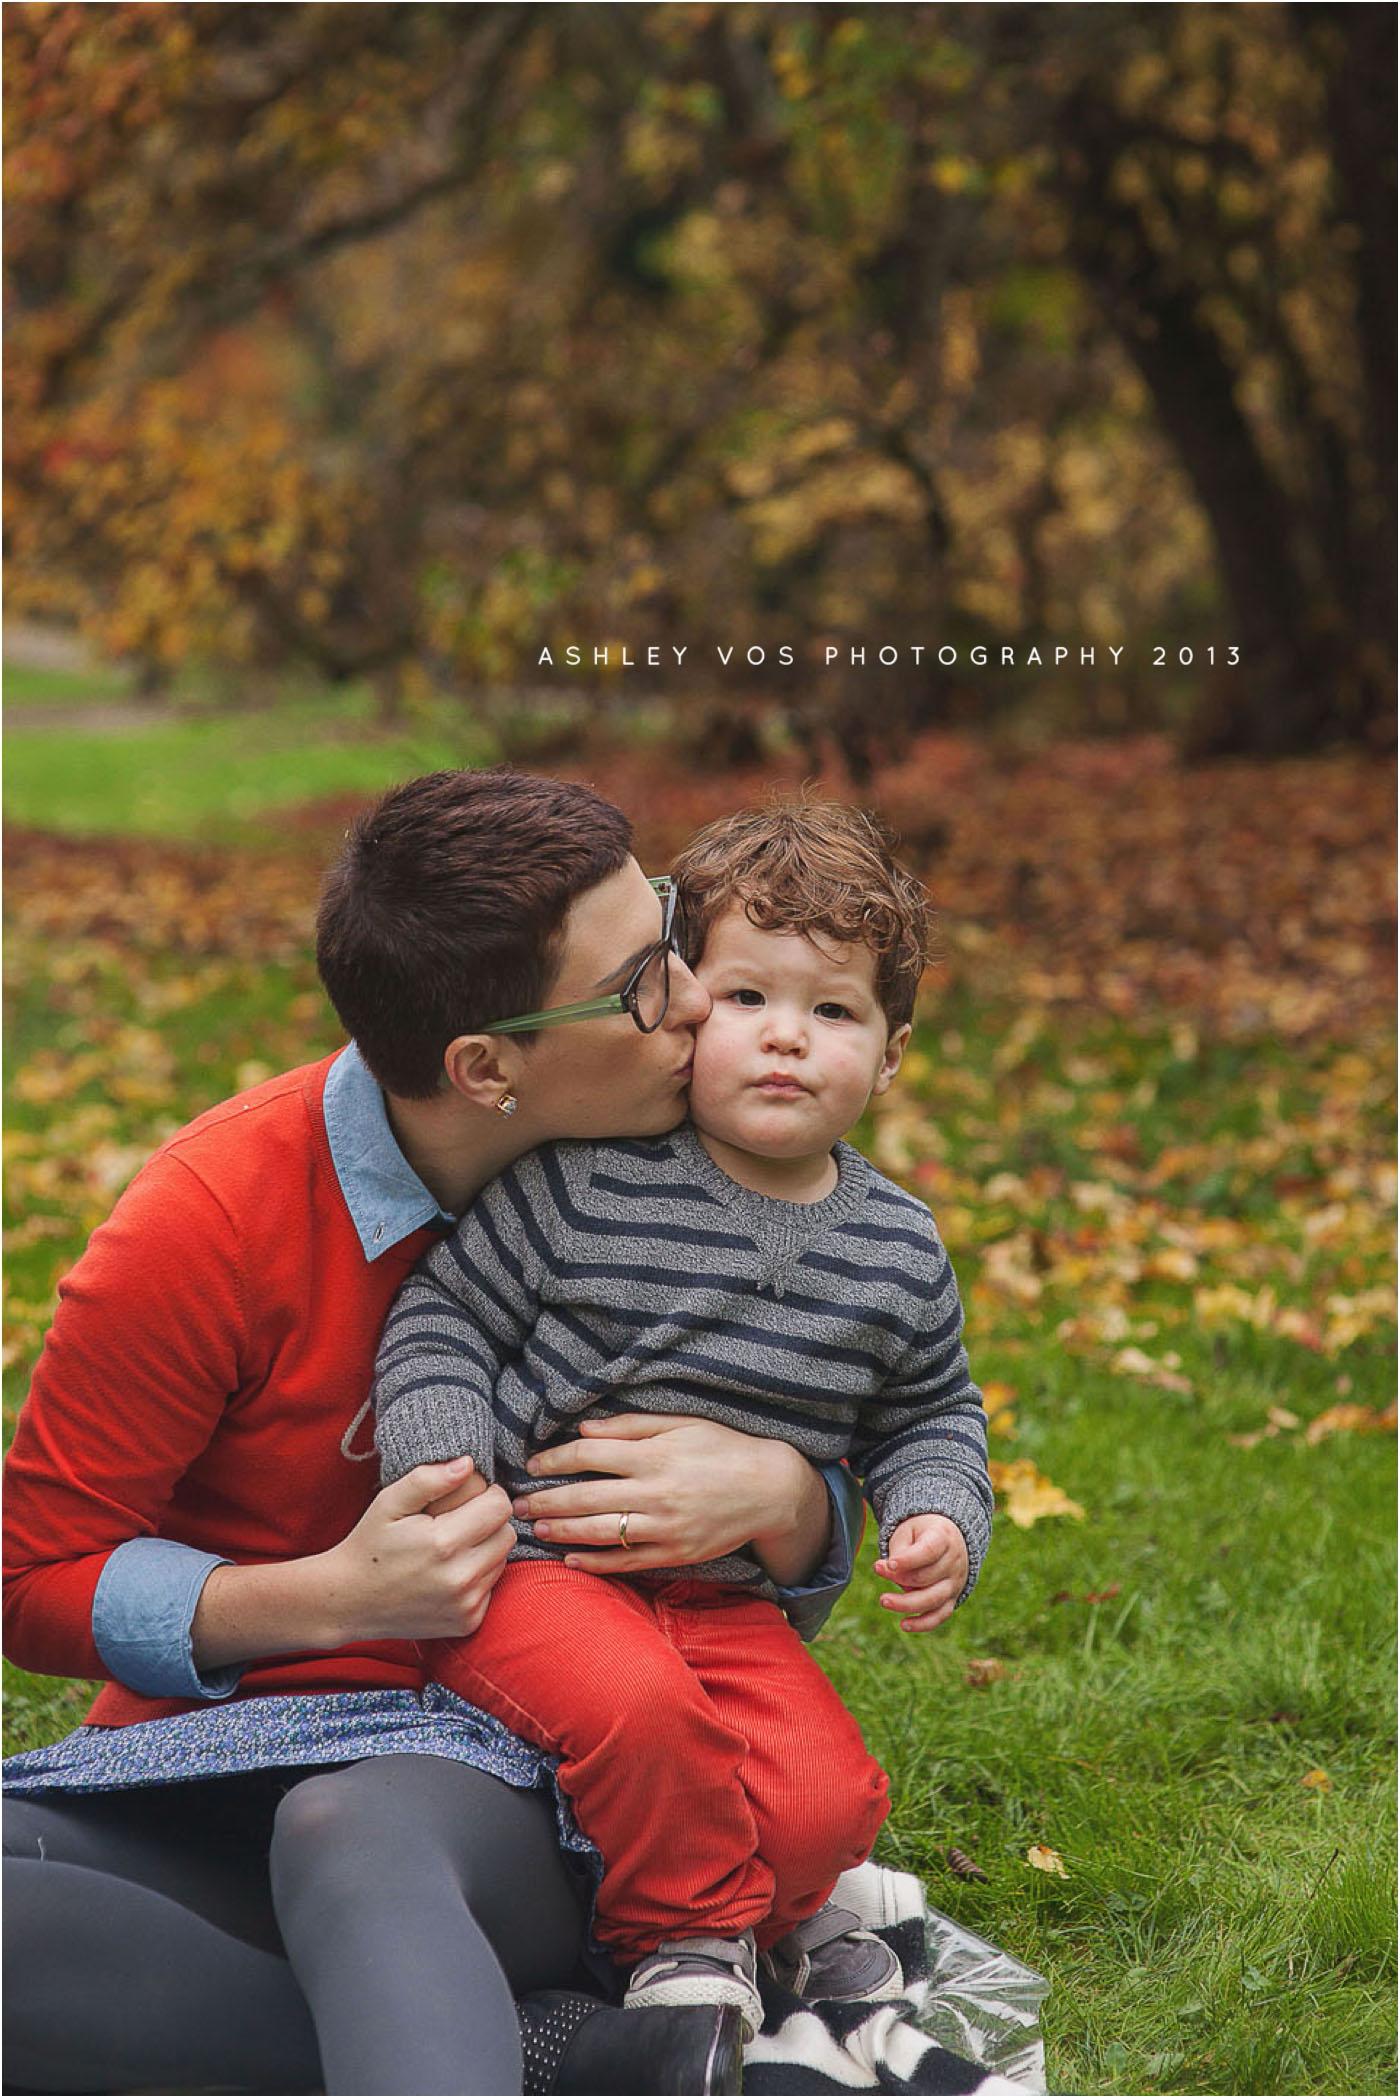 Ashley Vos Photography